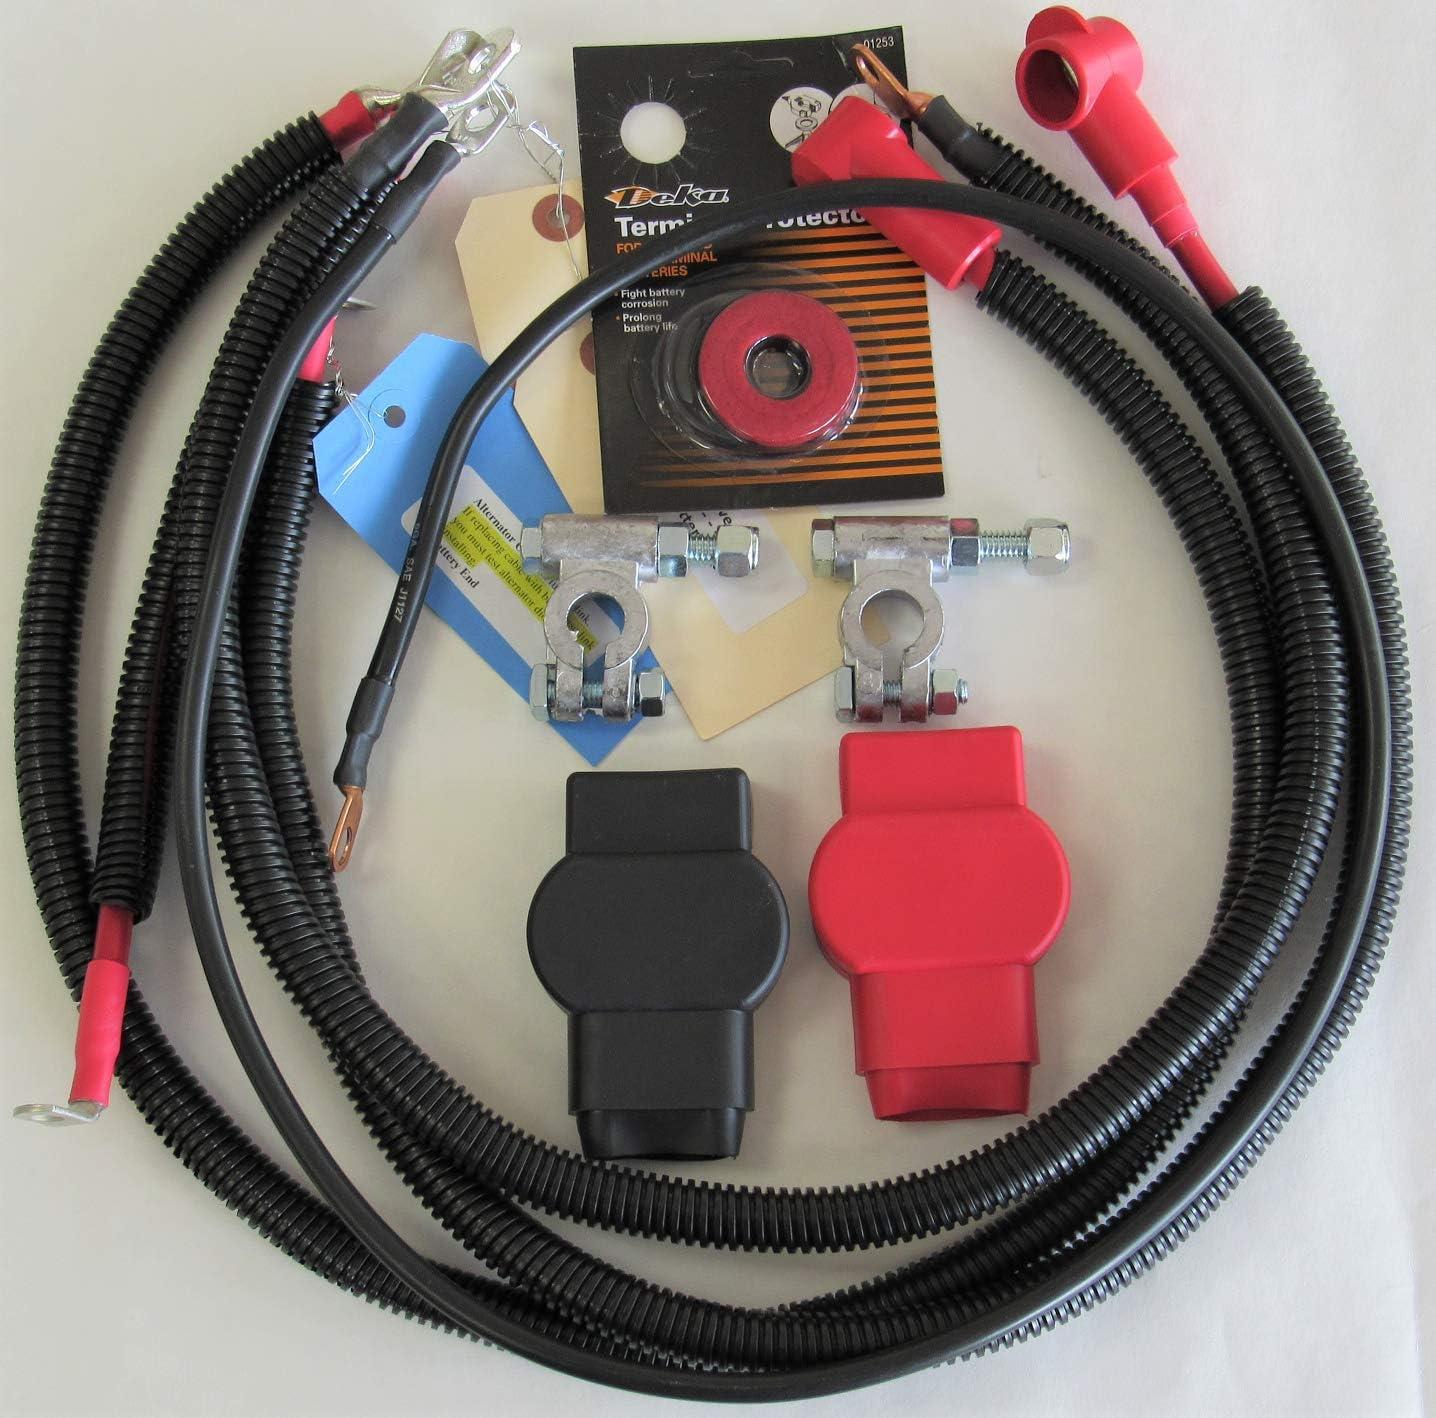 jeep tj battery wiring amazon com 1998 2006 jeep wrangler tj 6 cylinder 4 0l 2 gauge  2006 jeep wrangler tj 6 cylinder 4 0l